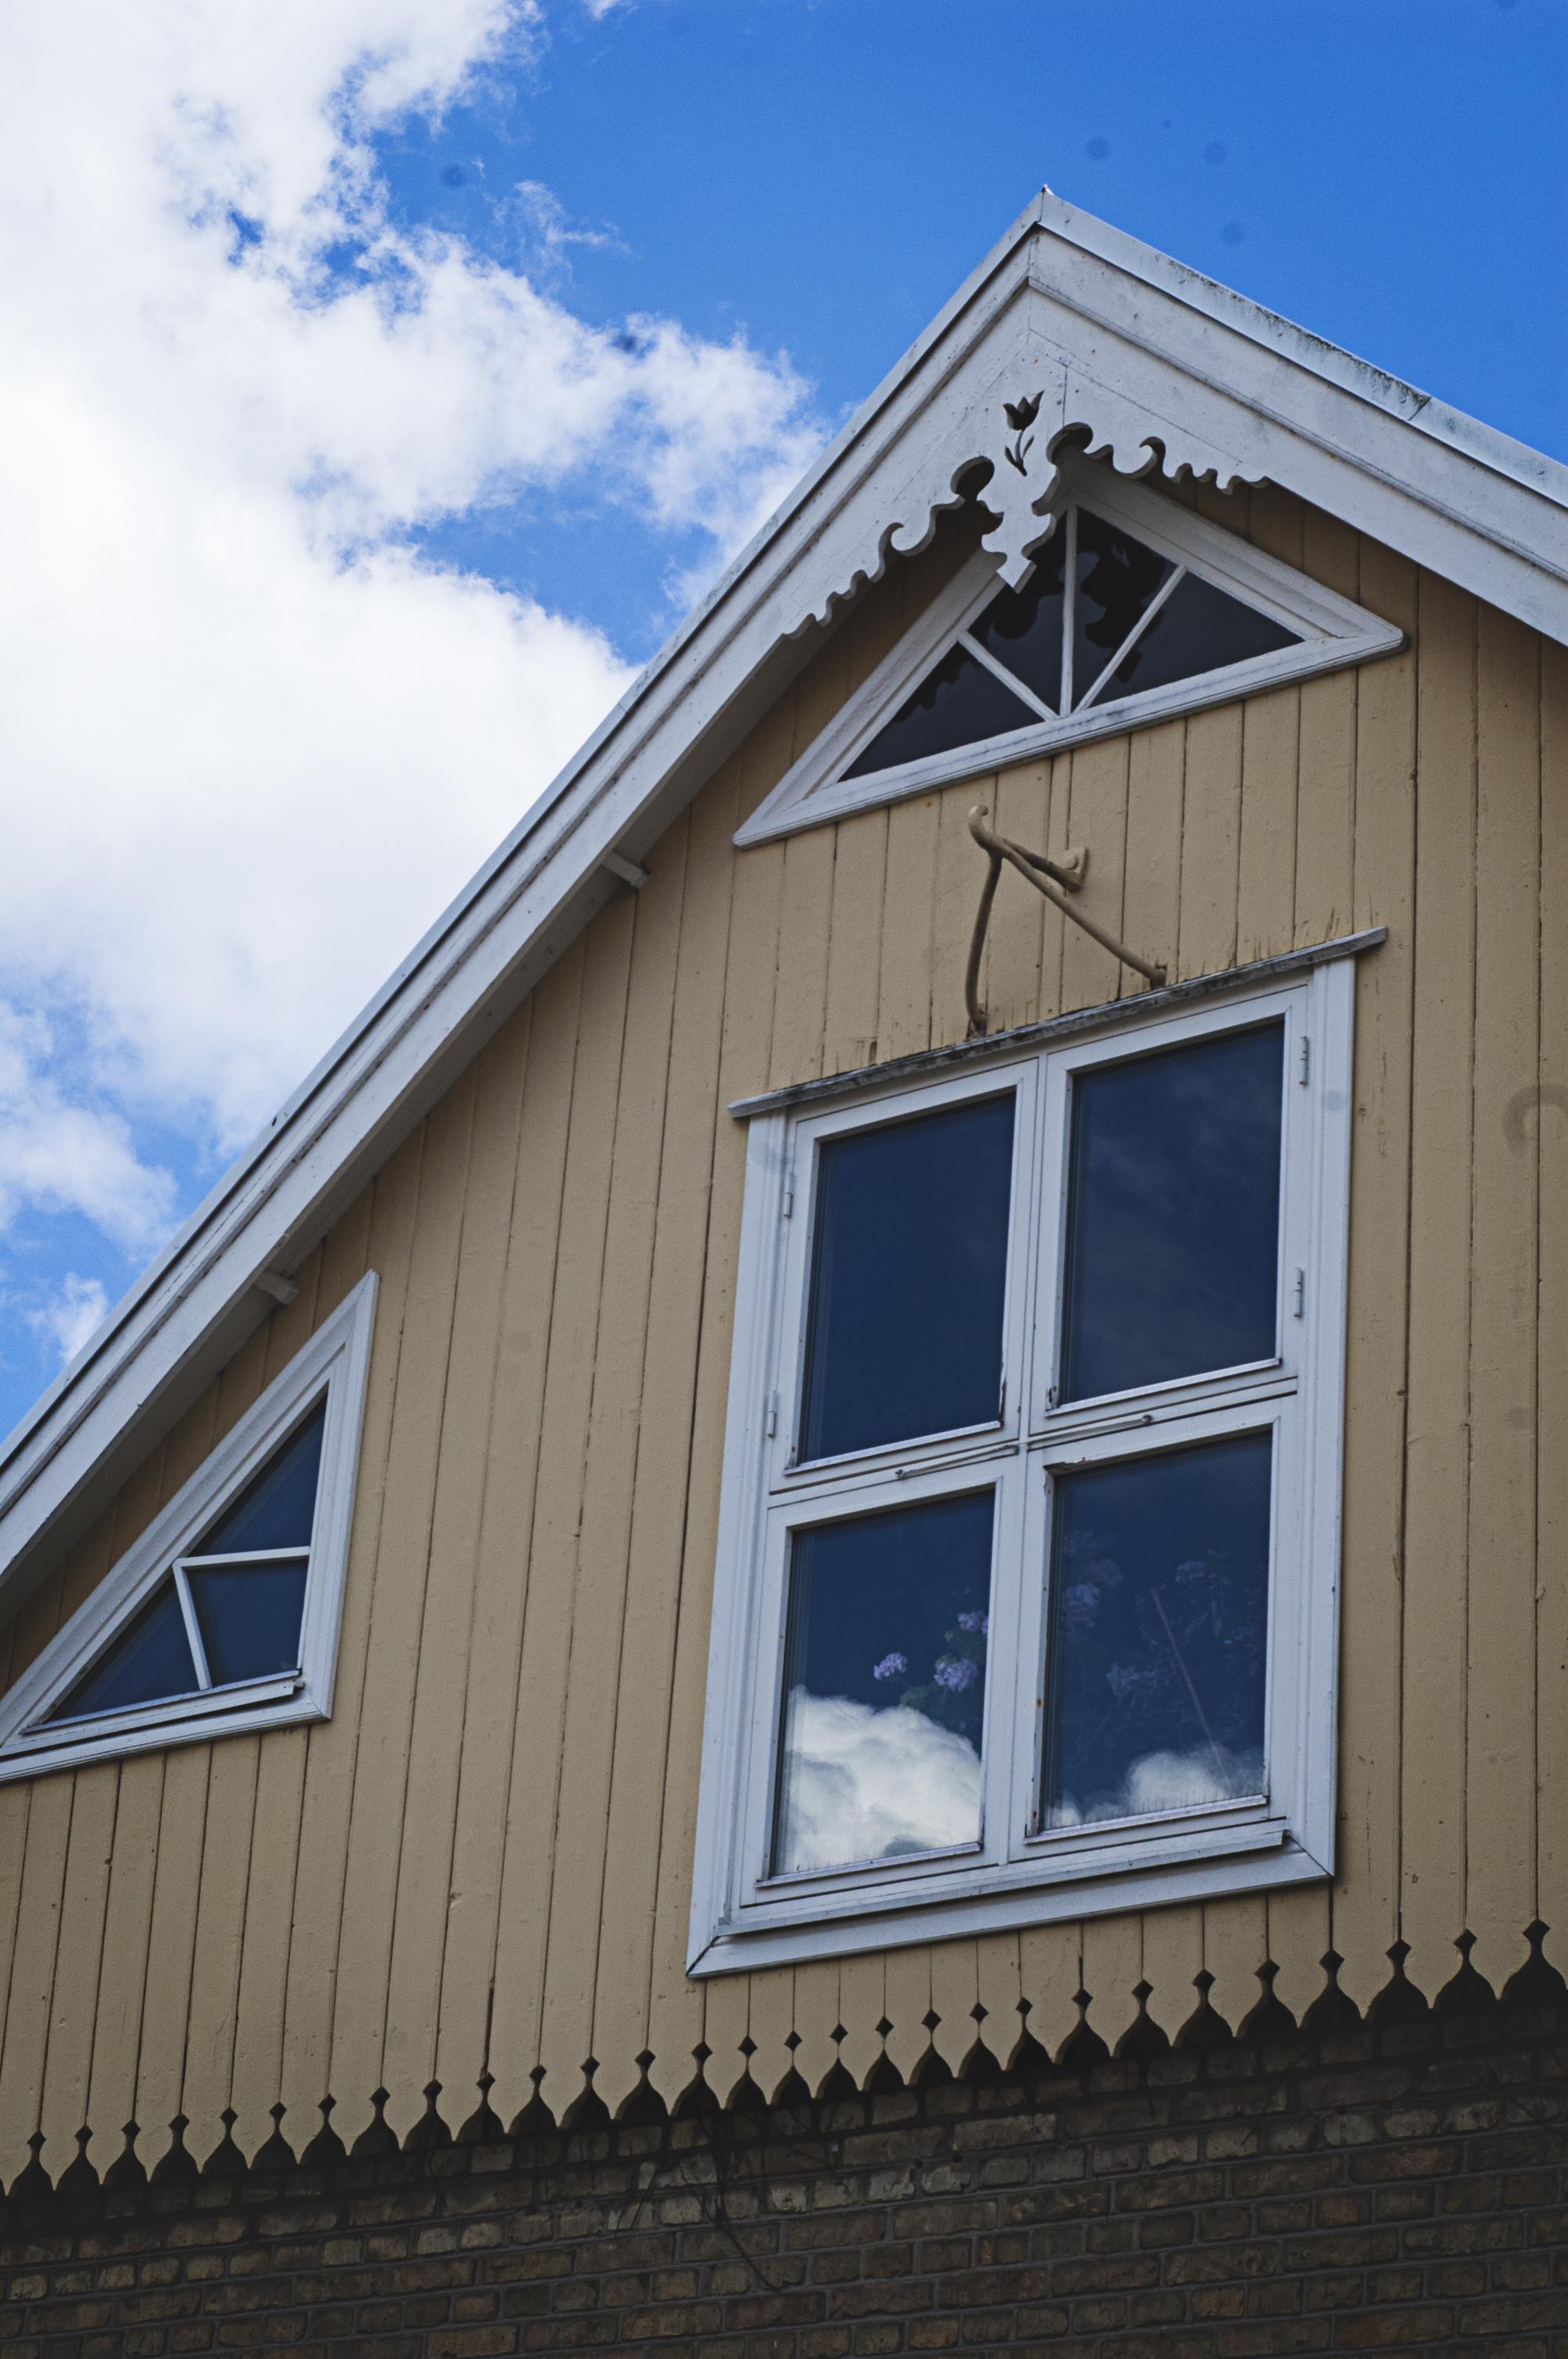 Afternoon Fika among the hollyhocks, Kivik